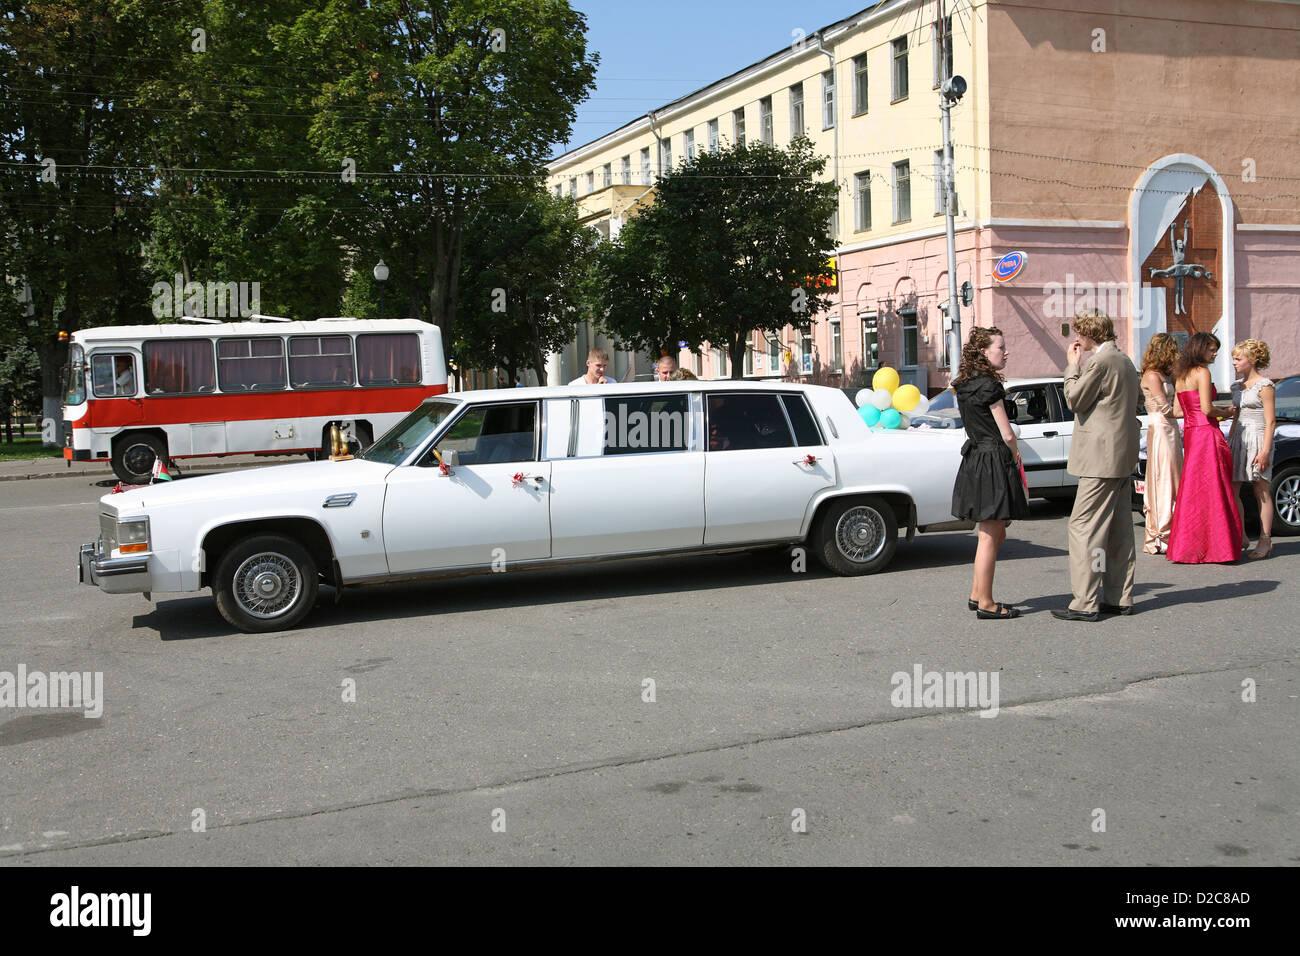 Gomel, Belarus, Hochzeitsgaeste with a rented limousine - Stock Image